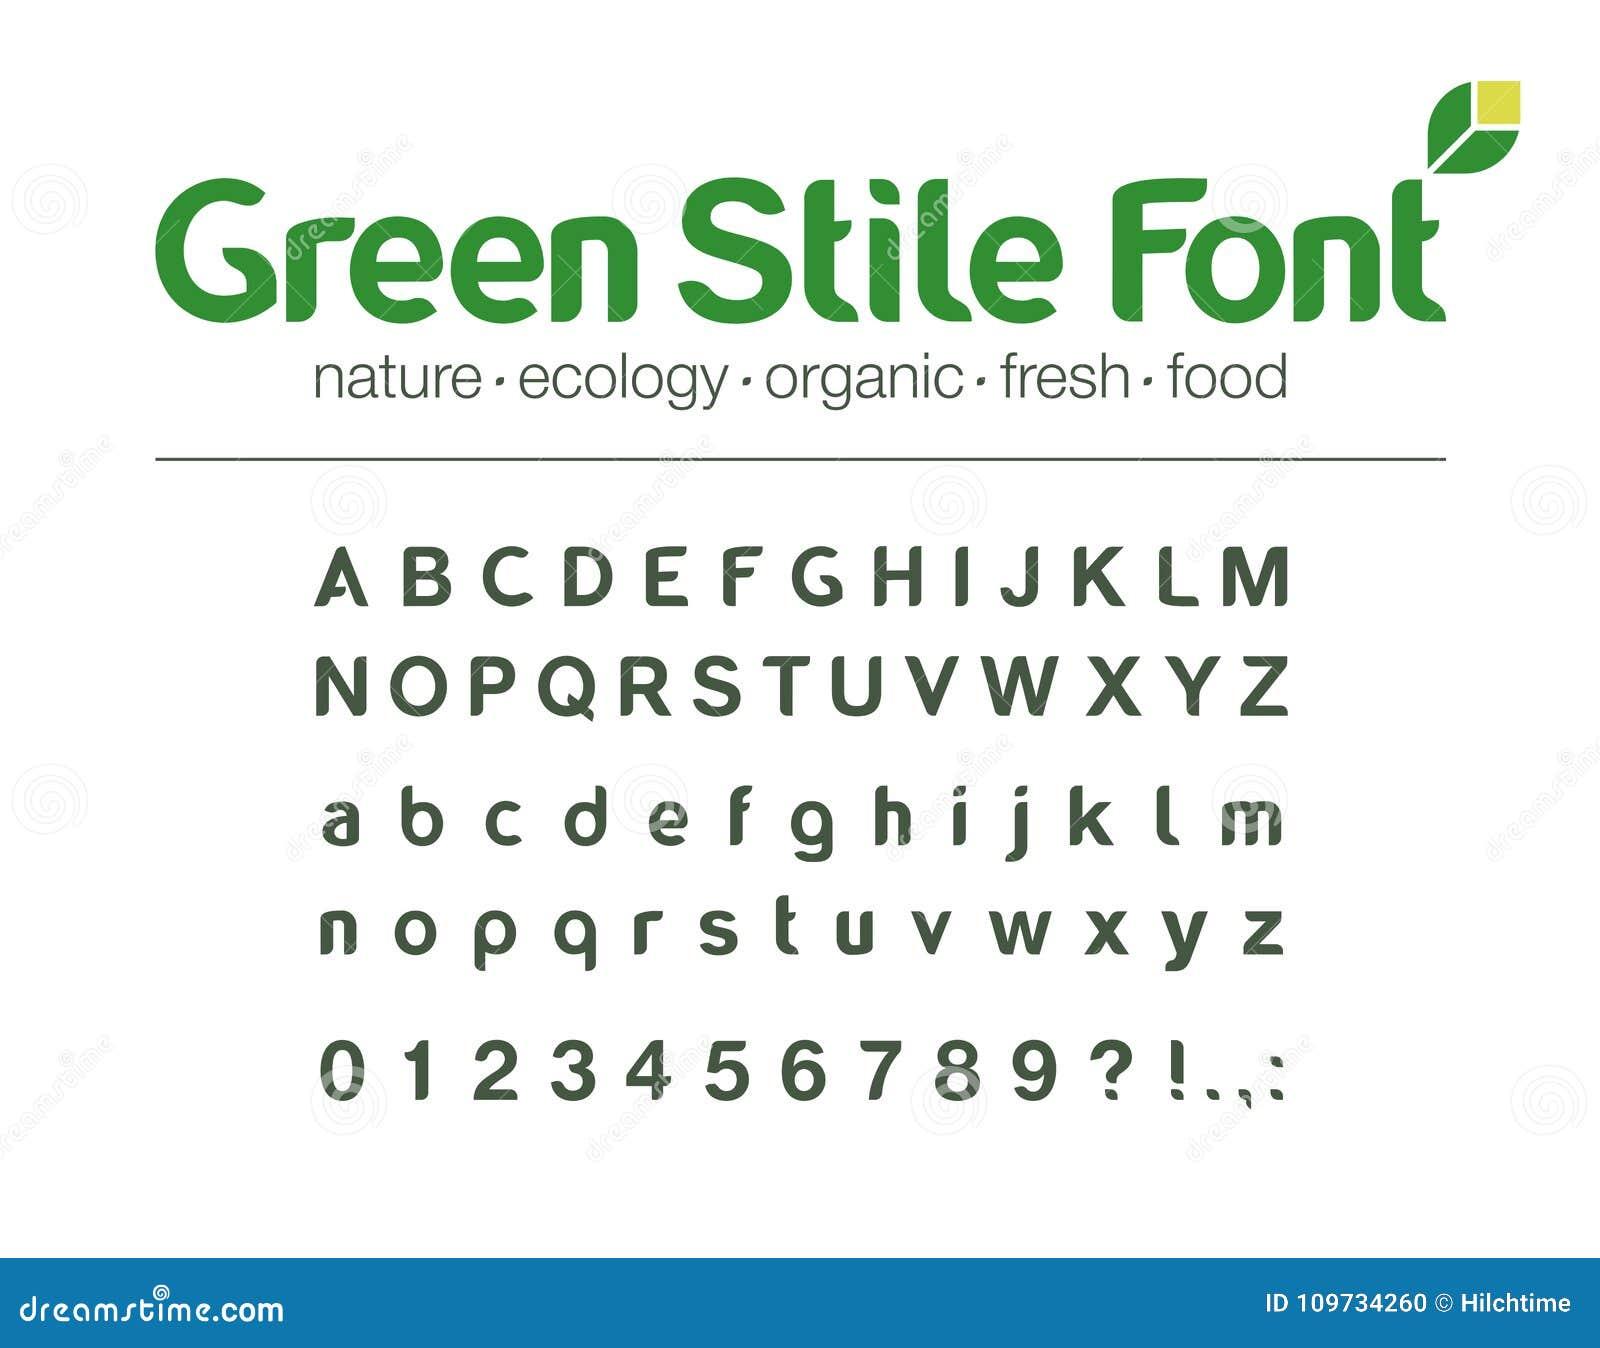 Modern Vector Typeface  Universal Font  Food, Drink, Organic, Nature